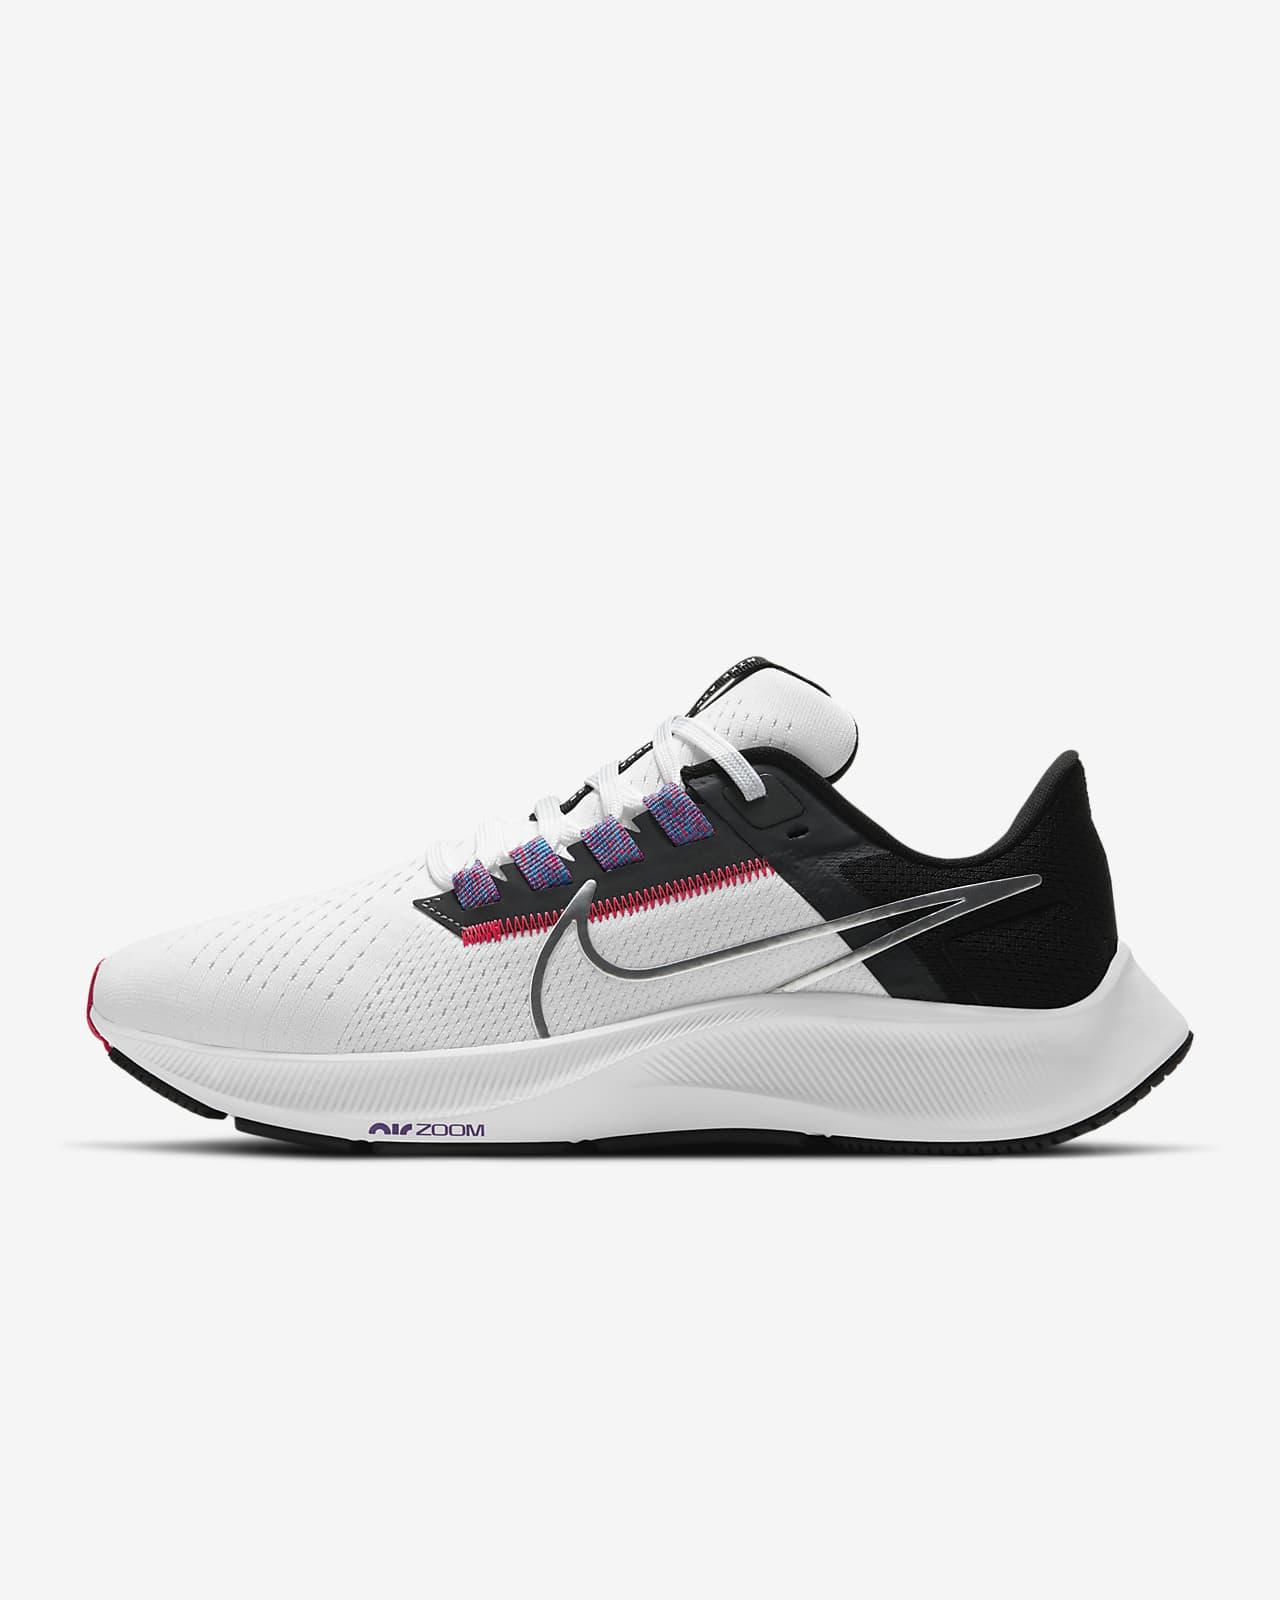 Chaussures de running Nike Air Zoom Pegasus 38 pour Femme